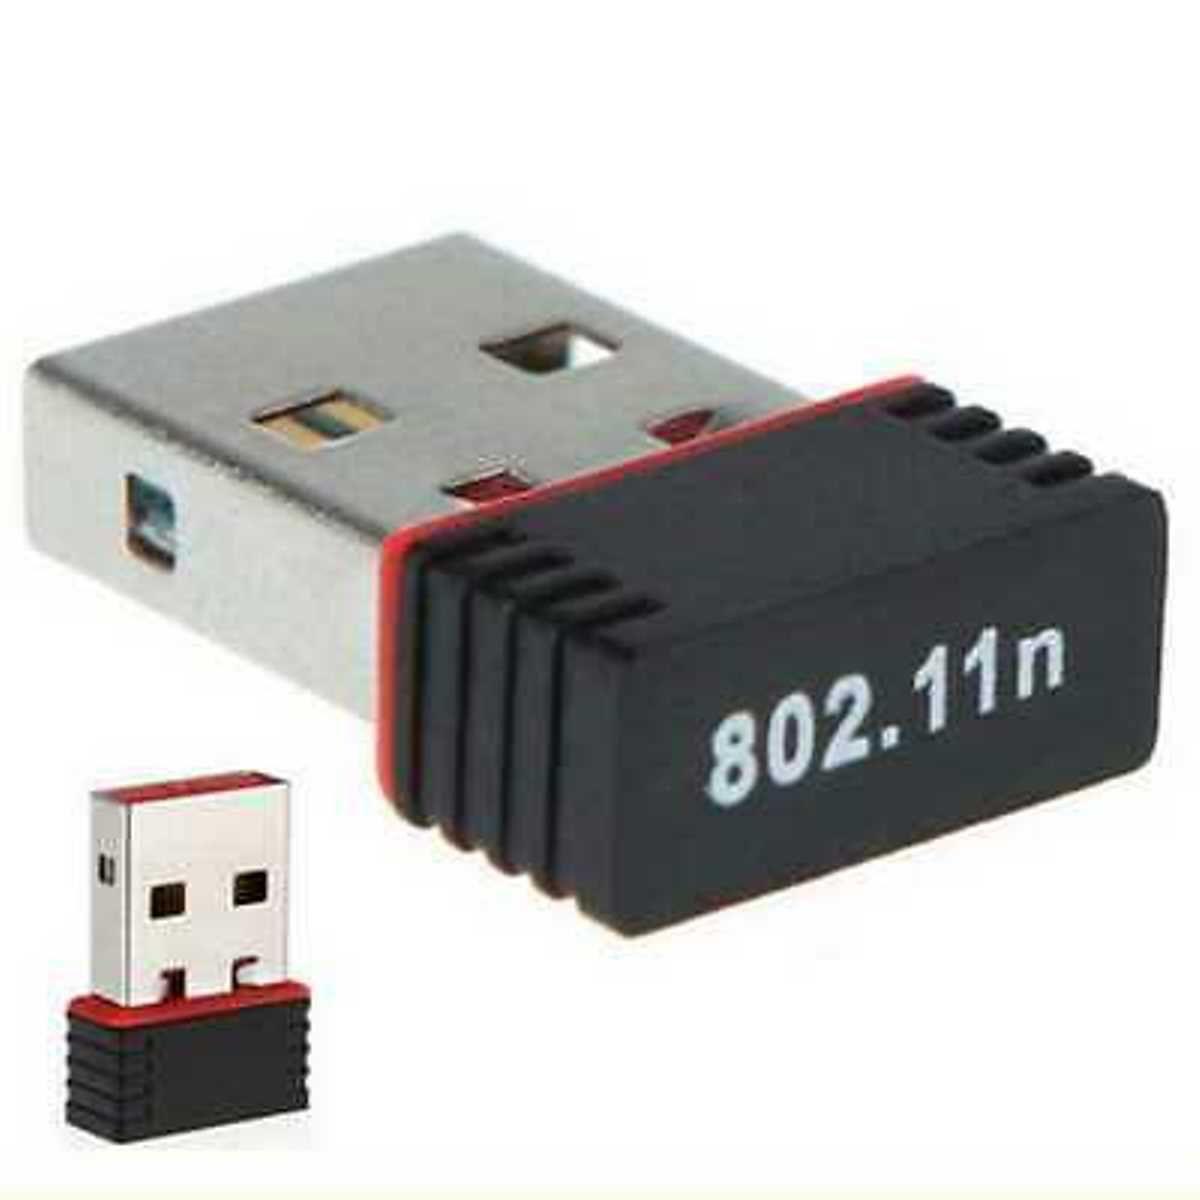 Adaptador Usb 950mbps Receptor Sinal Wifi Sem Fio Internet